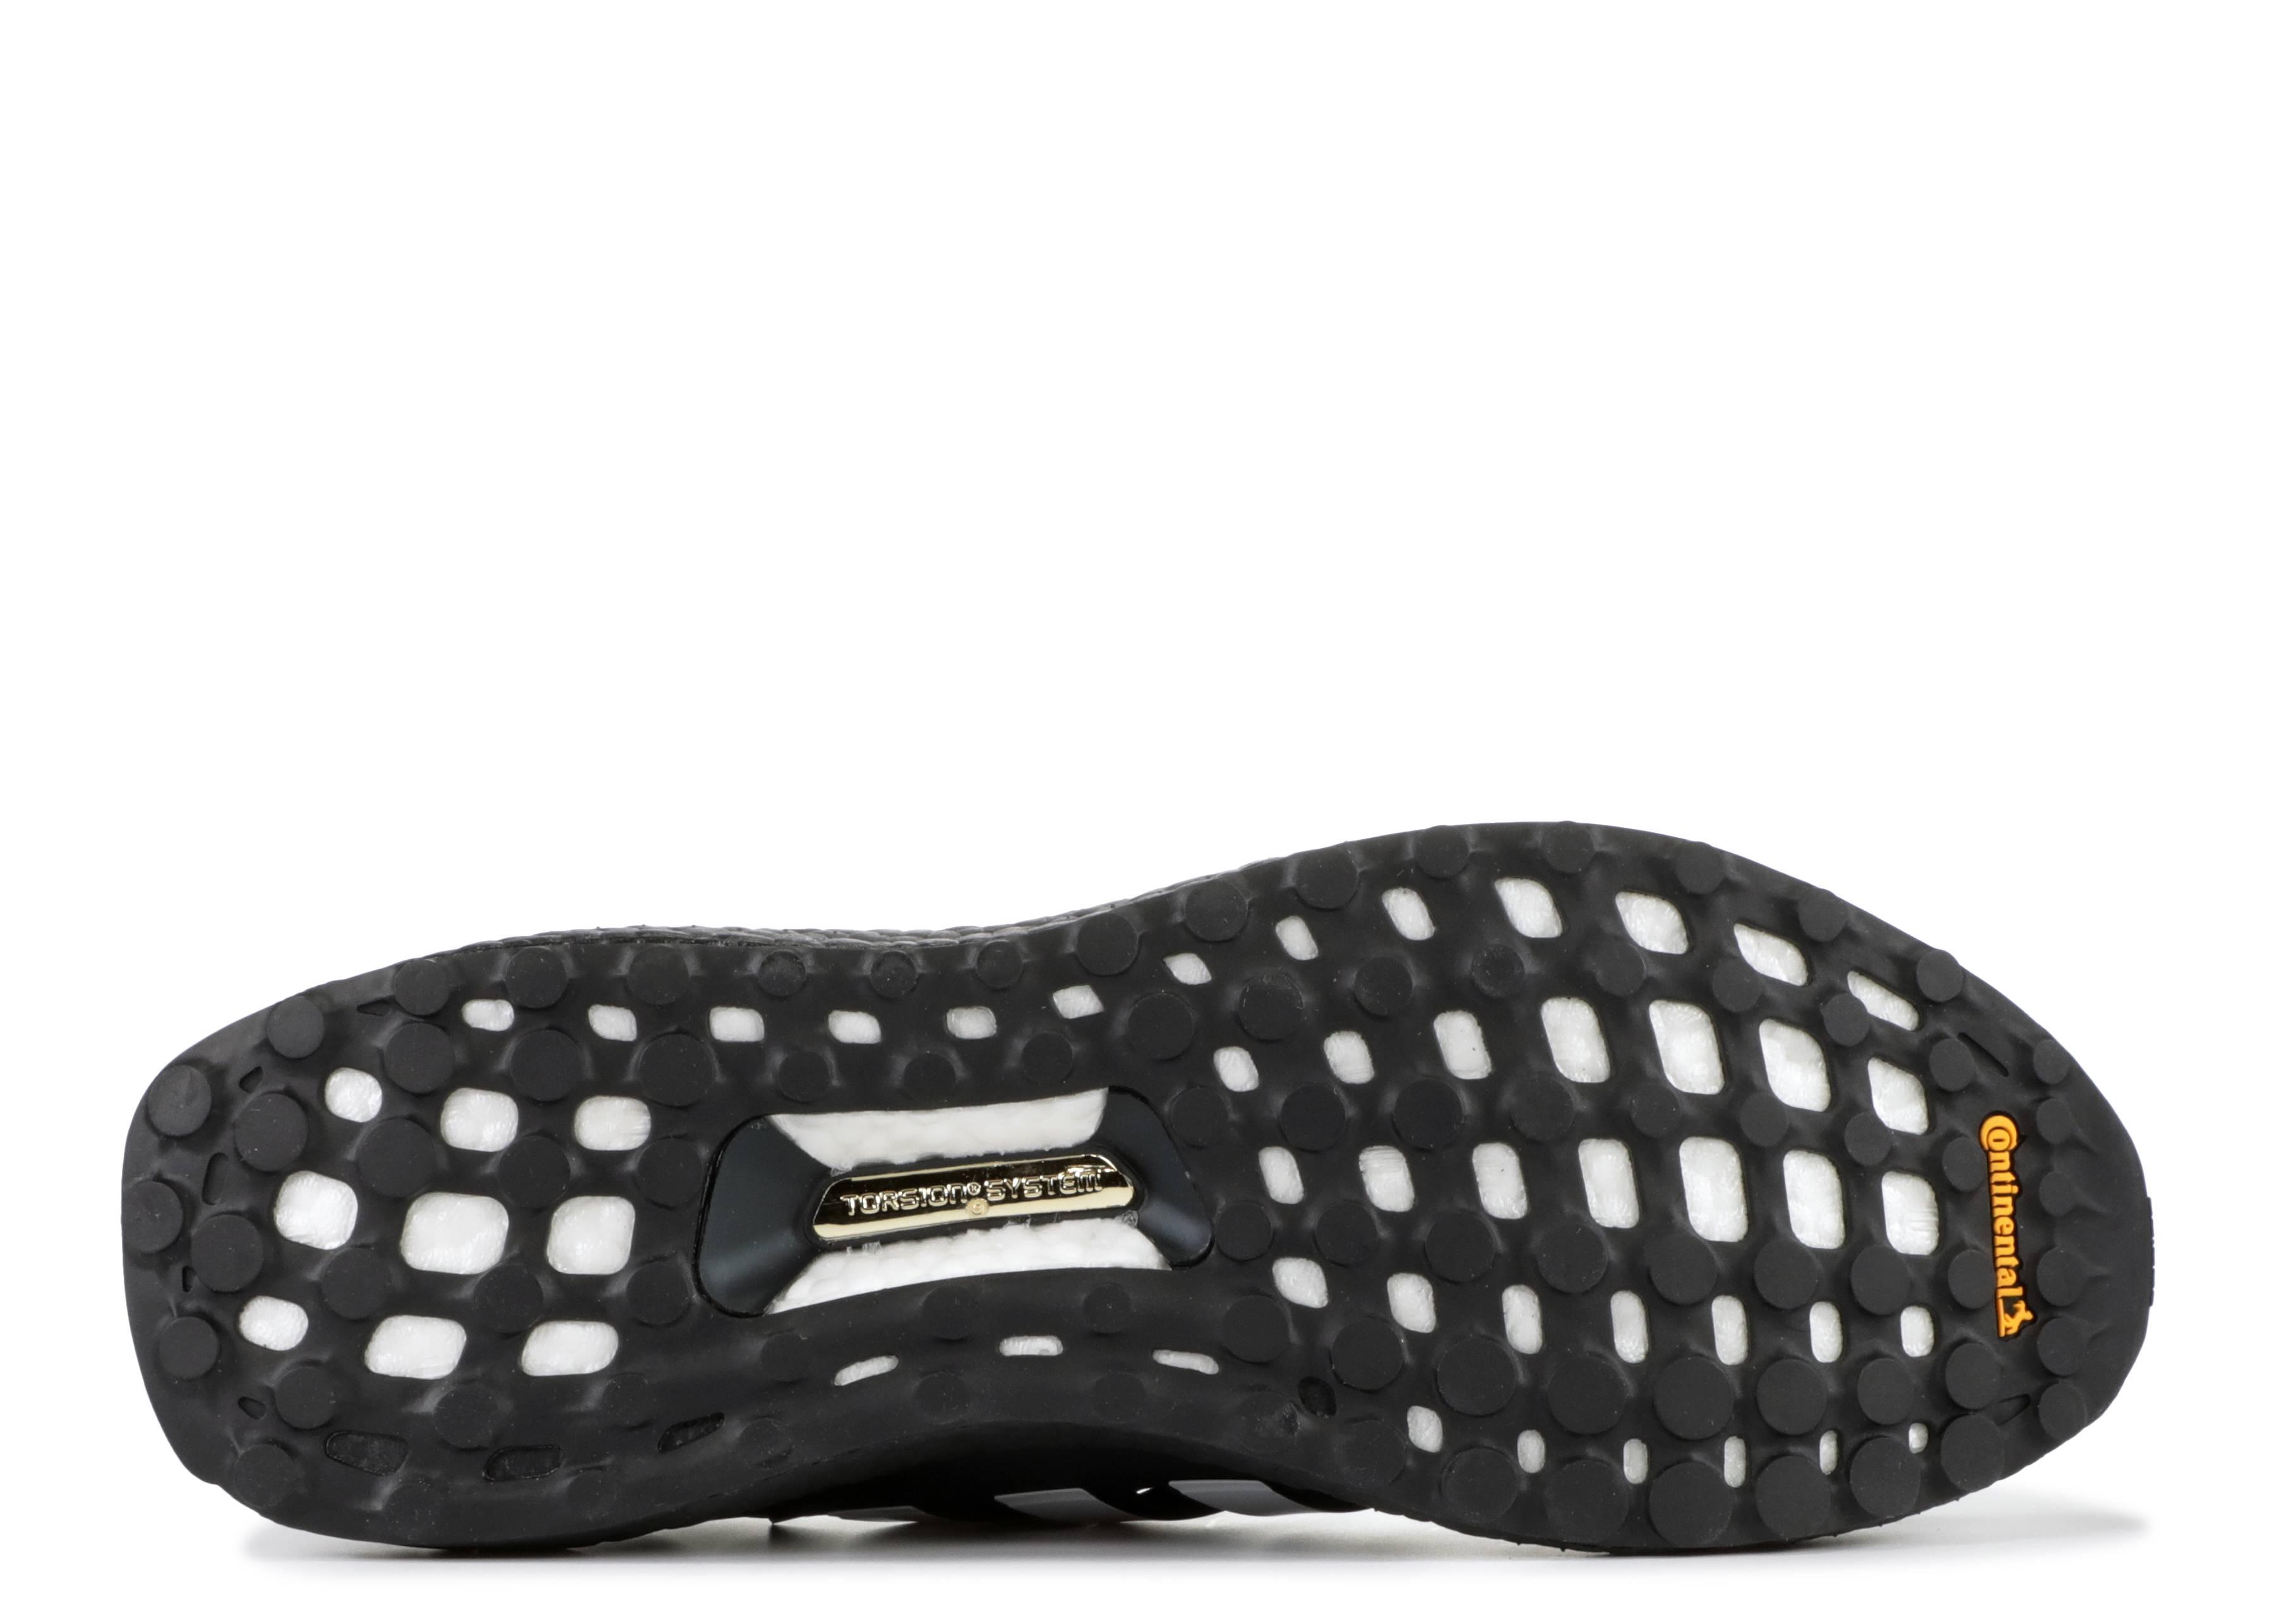 Adidas Ultra Boost 4.0 X BAPE Camo Black*